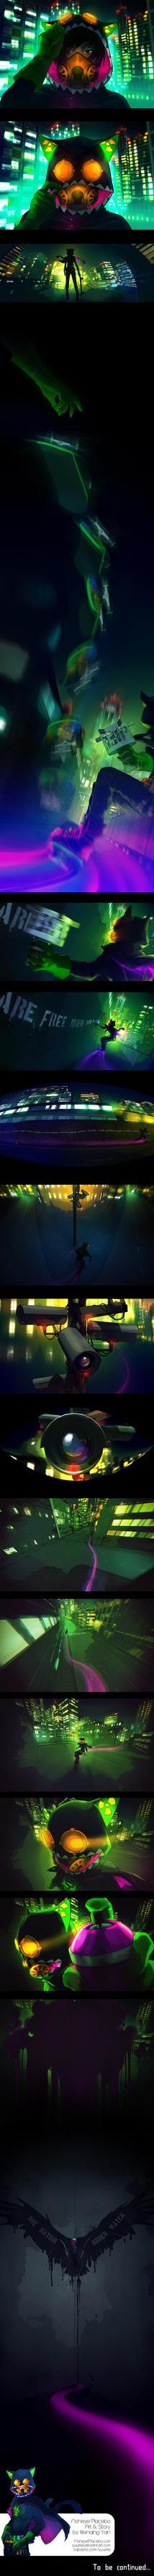 Fisheye Placebo: Ch1 [][][][][][][][] by yuumei